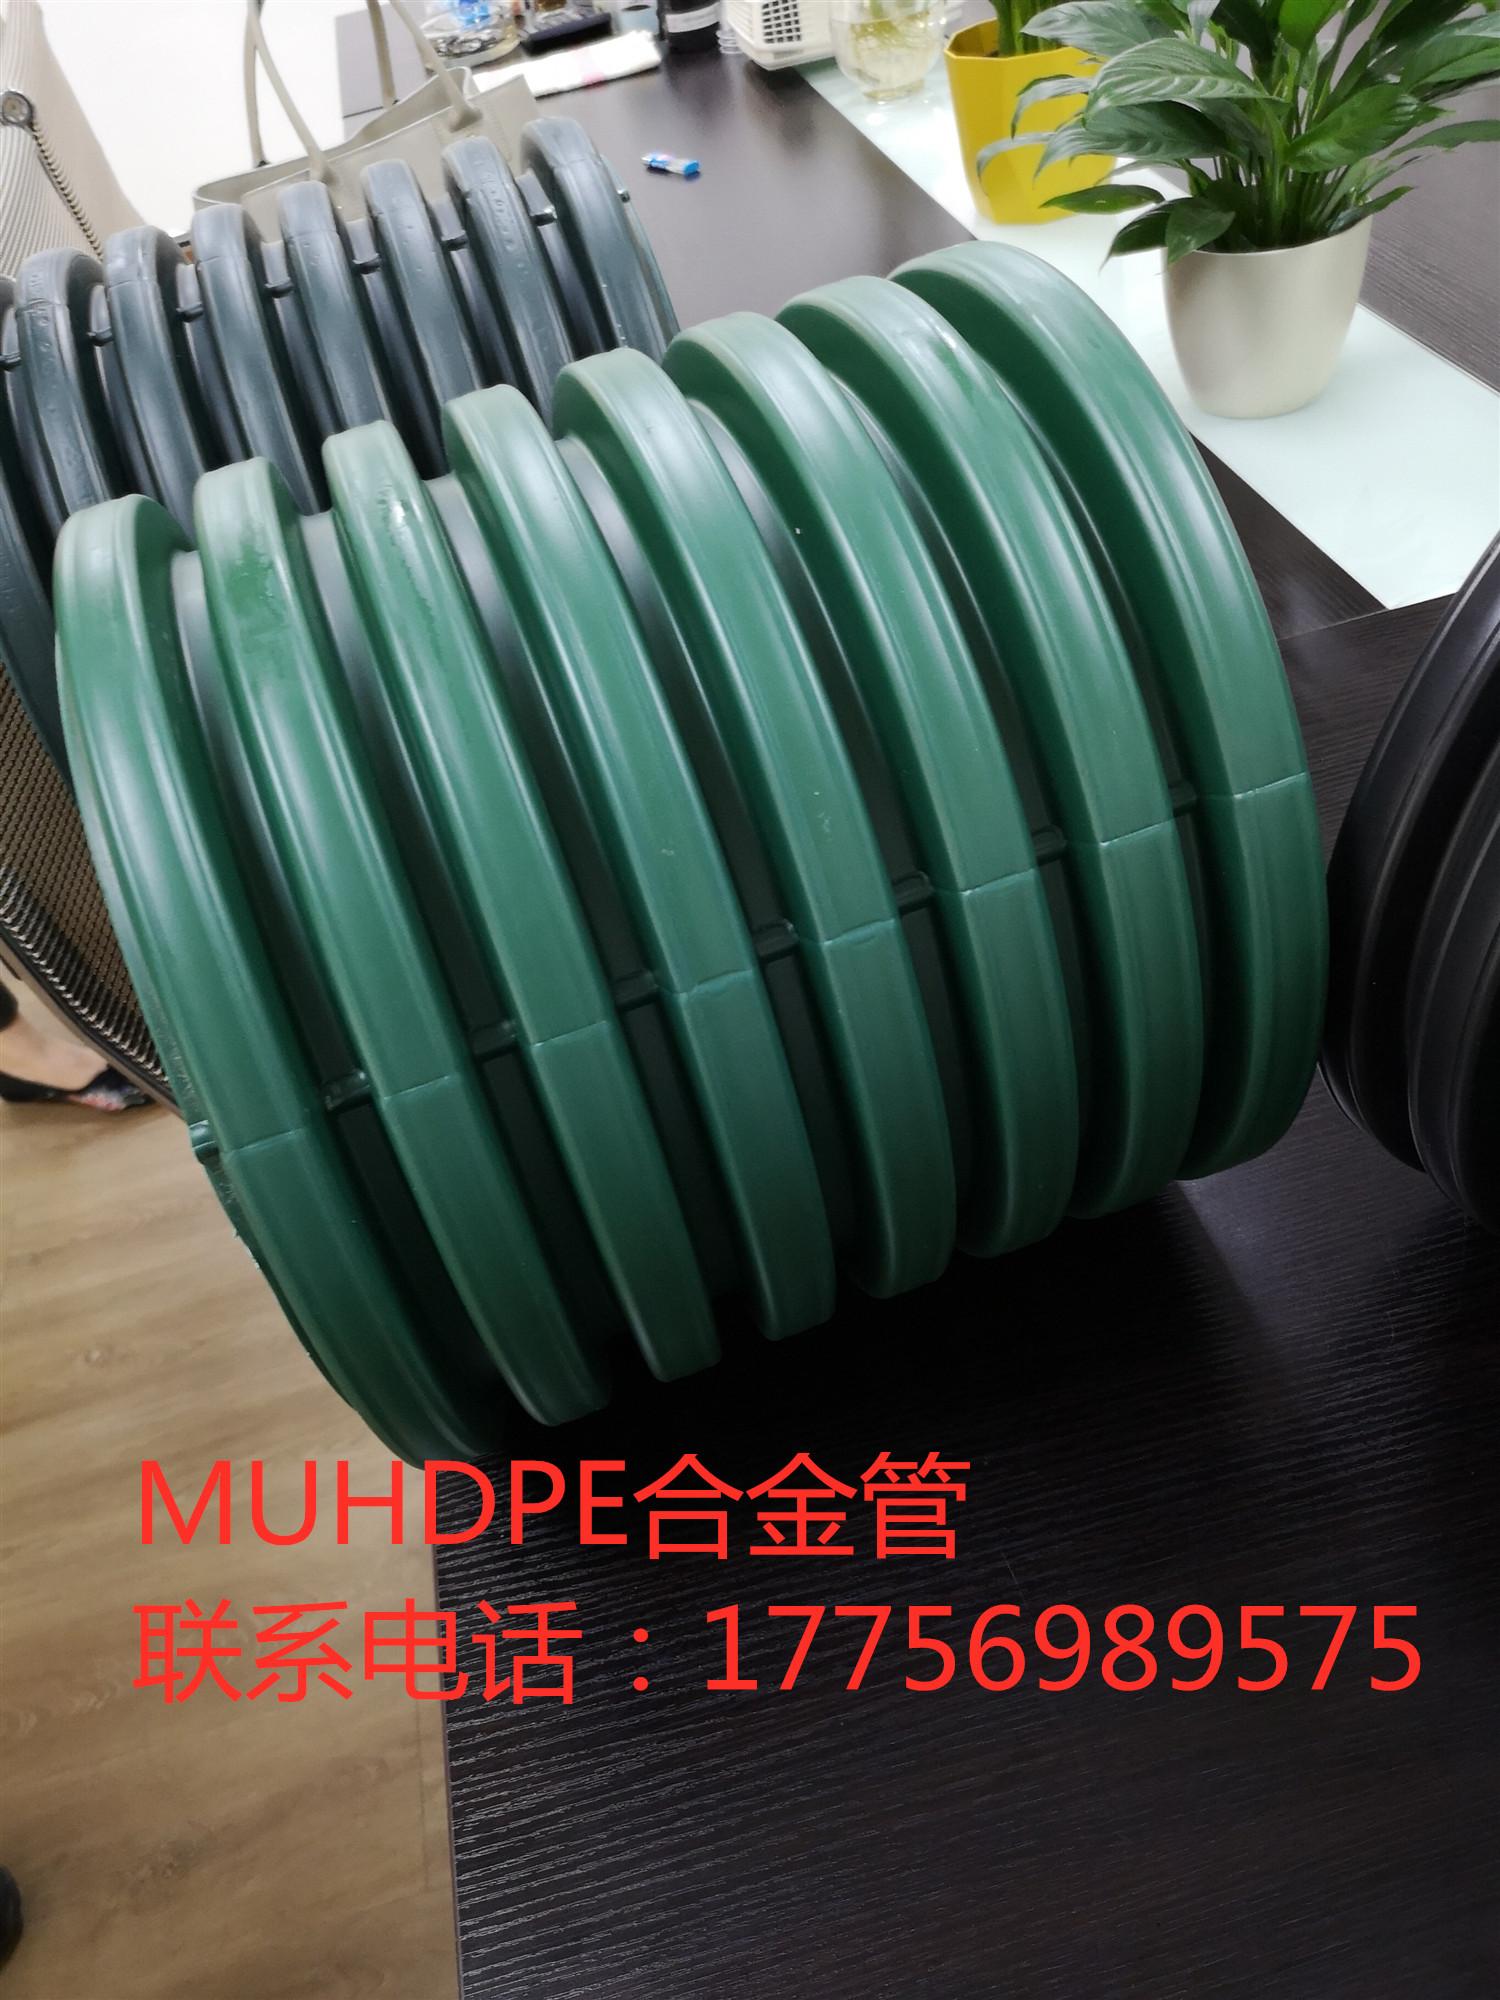 muhdpe合金管生产厂家直销环刚度从SN8-SN24环柔达30%以上全能性产品产品质量优于克拉管